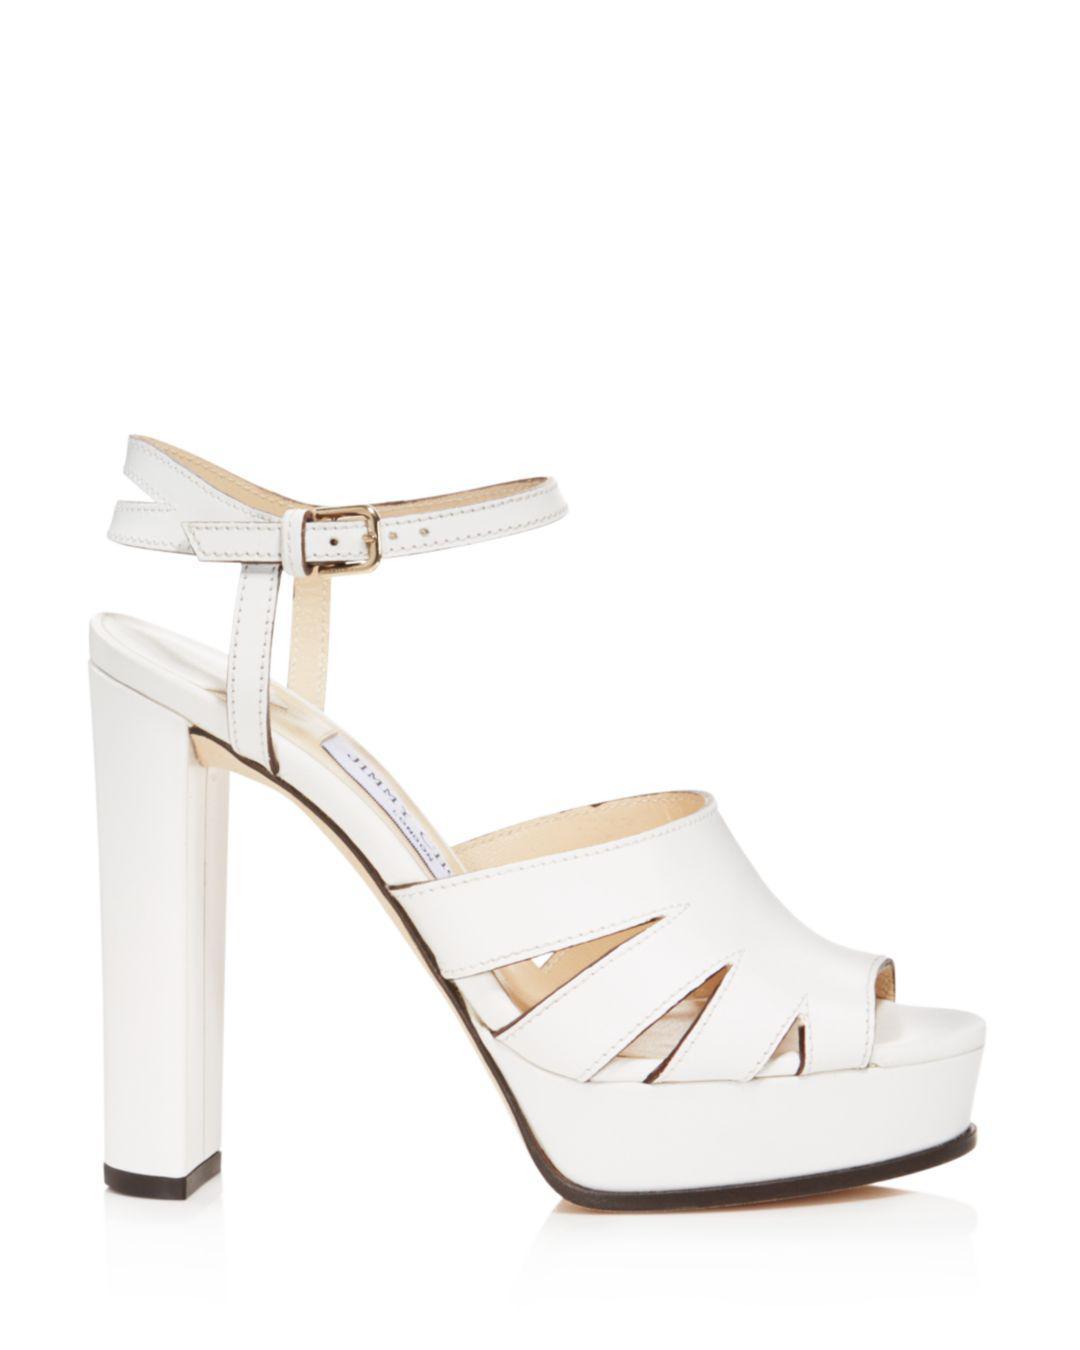 6d06cd2d5a3 Lyst - Jimmy Choo Women s Hermione 120 Leather Platform High-heel Sandals -  Save 60%